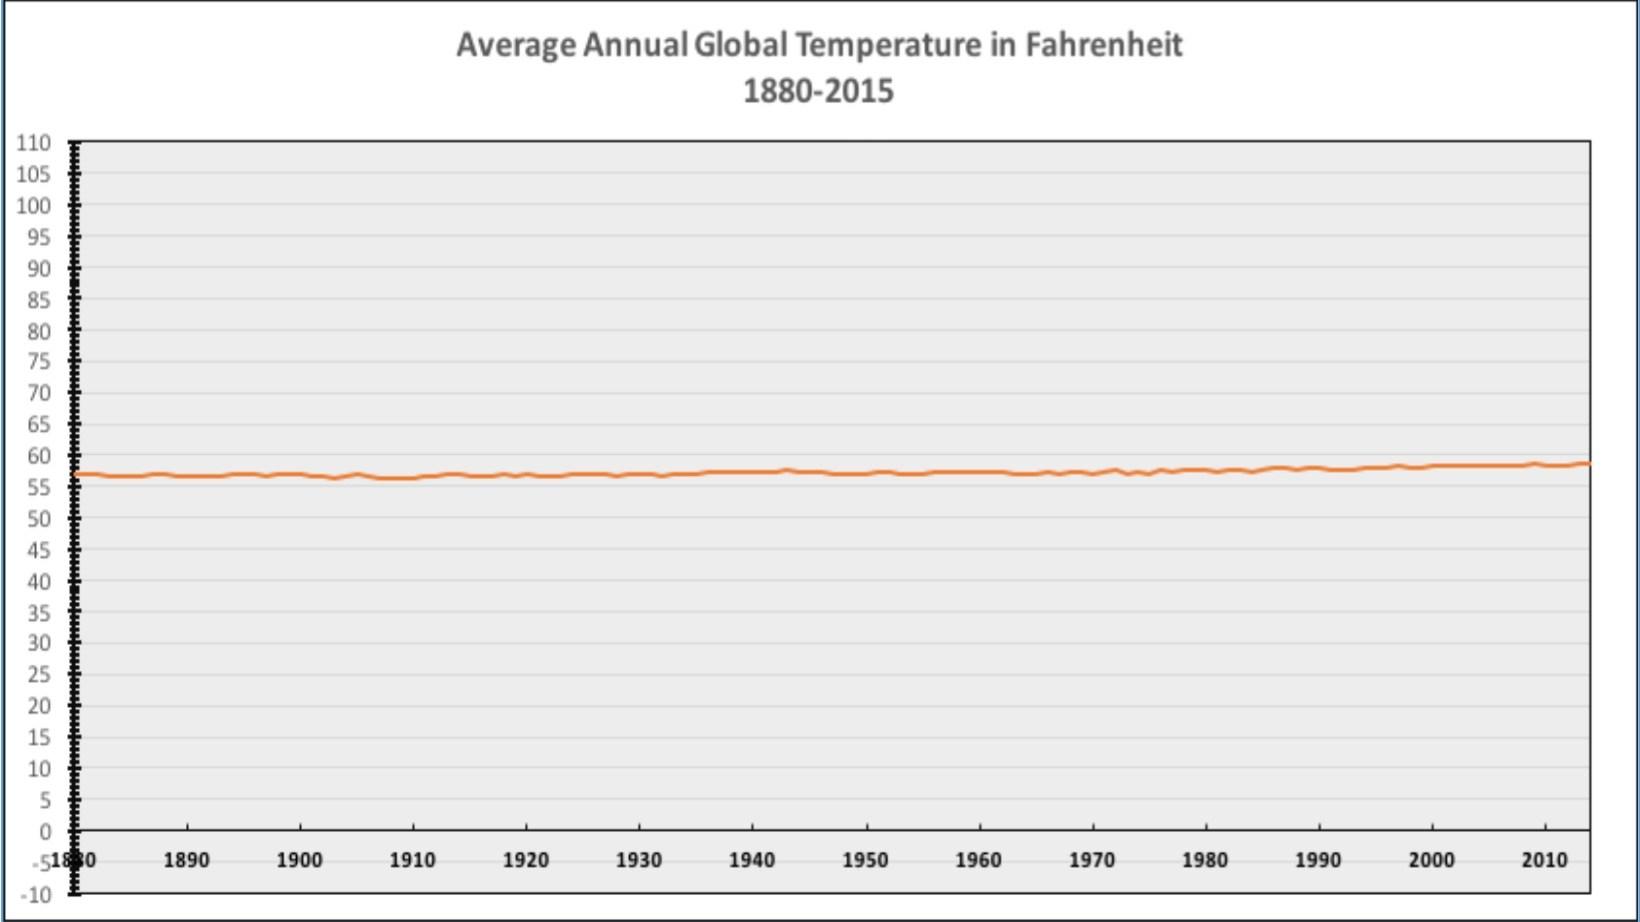 plot of chunk nro_powerline_temperatures